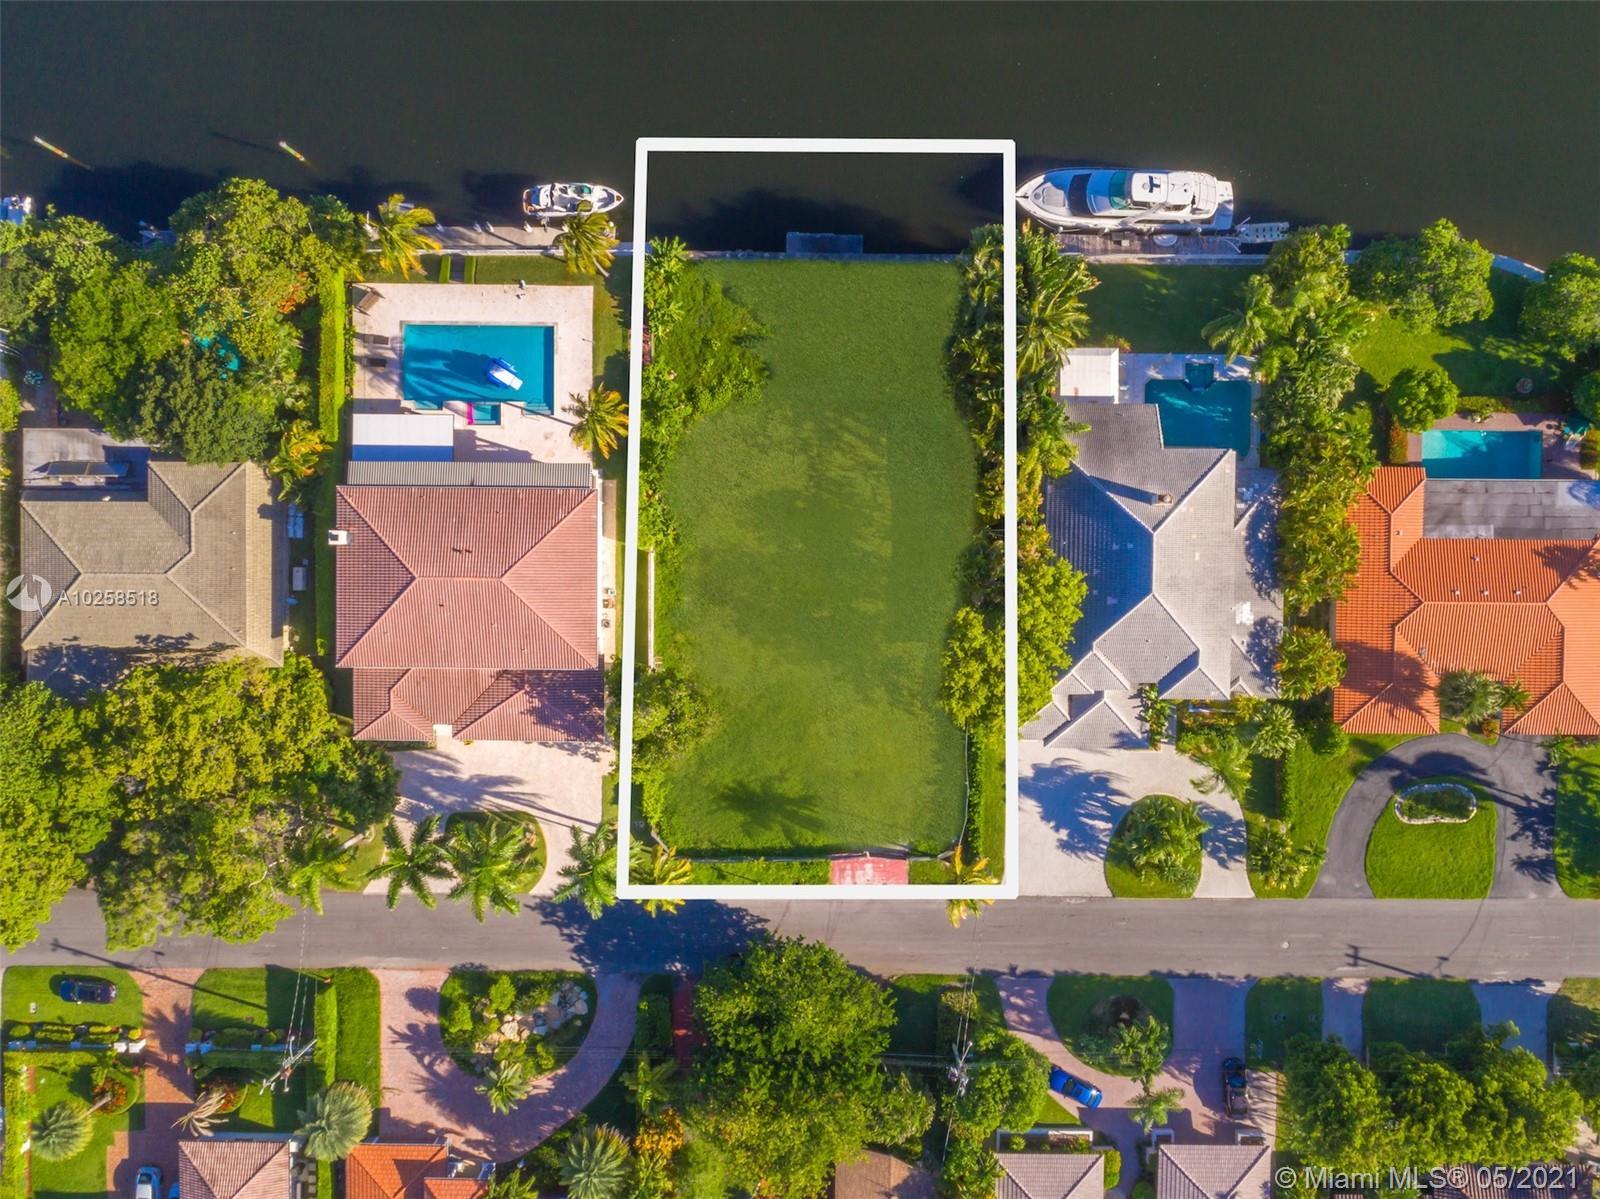 479 Tamarind Drive, Hallandale FL 33009 - Photo 2